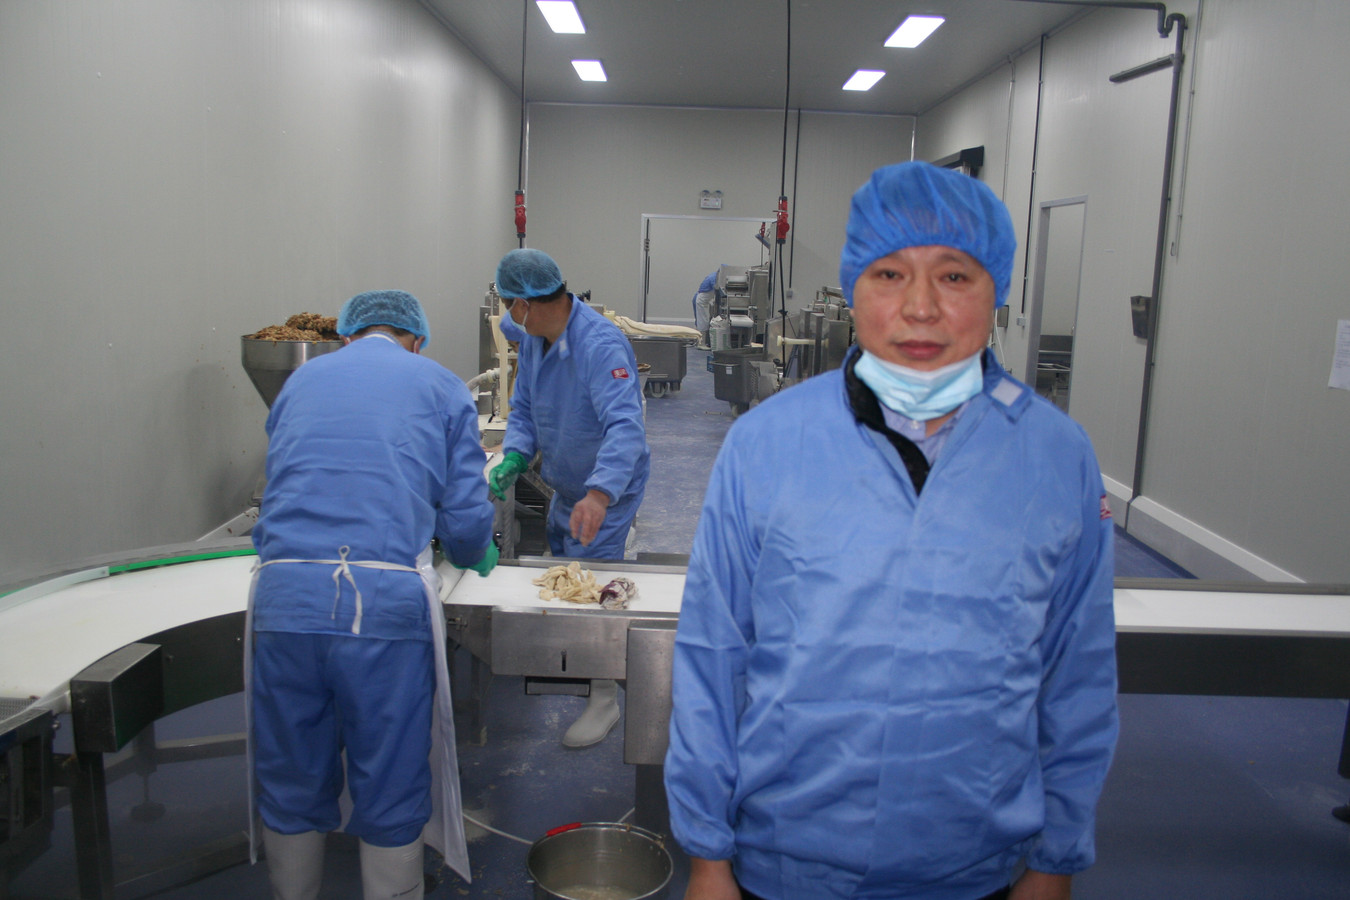 Tony Nai wil met Euro Dumplings de markt bestormen in West-Europa.